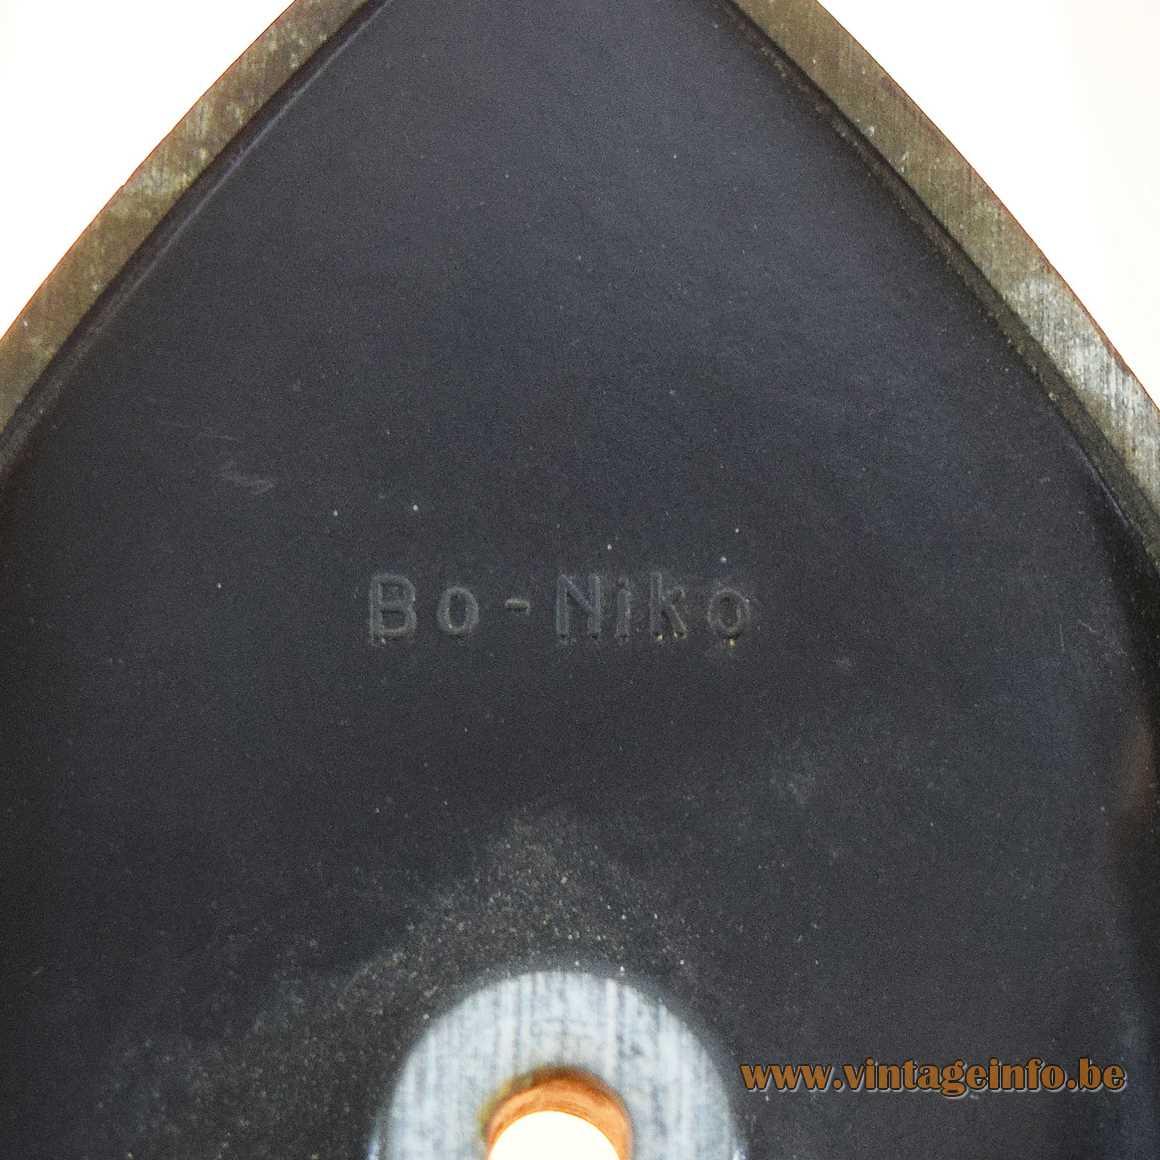 Bo-Niko Logo on a Bo-Niko wall lamp Bakelite 1960s 1970s Sint-Niklaas Belgium